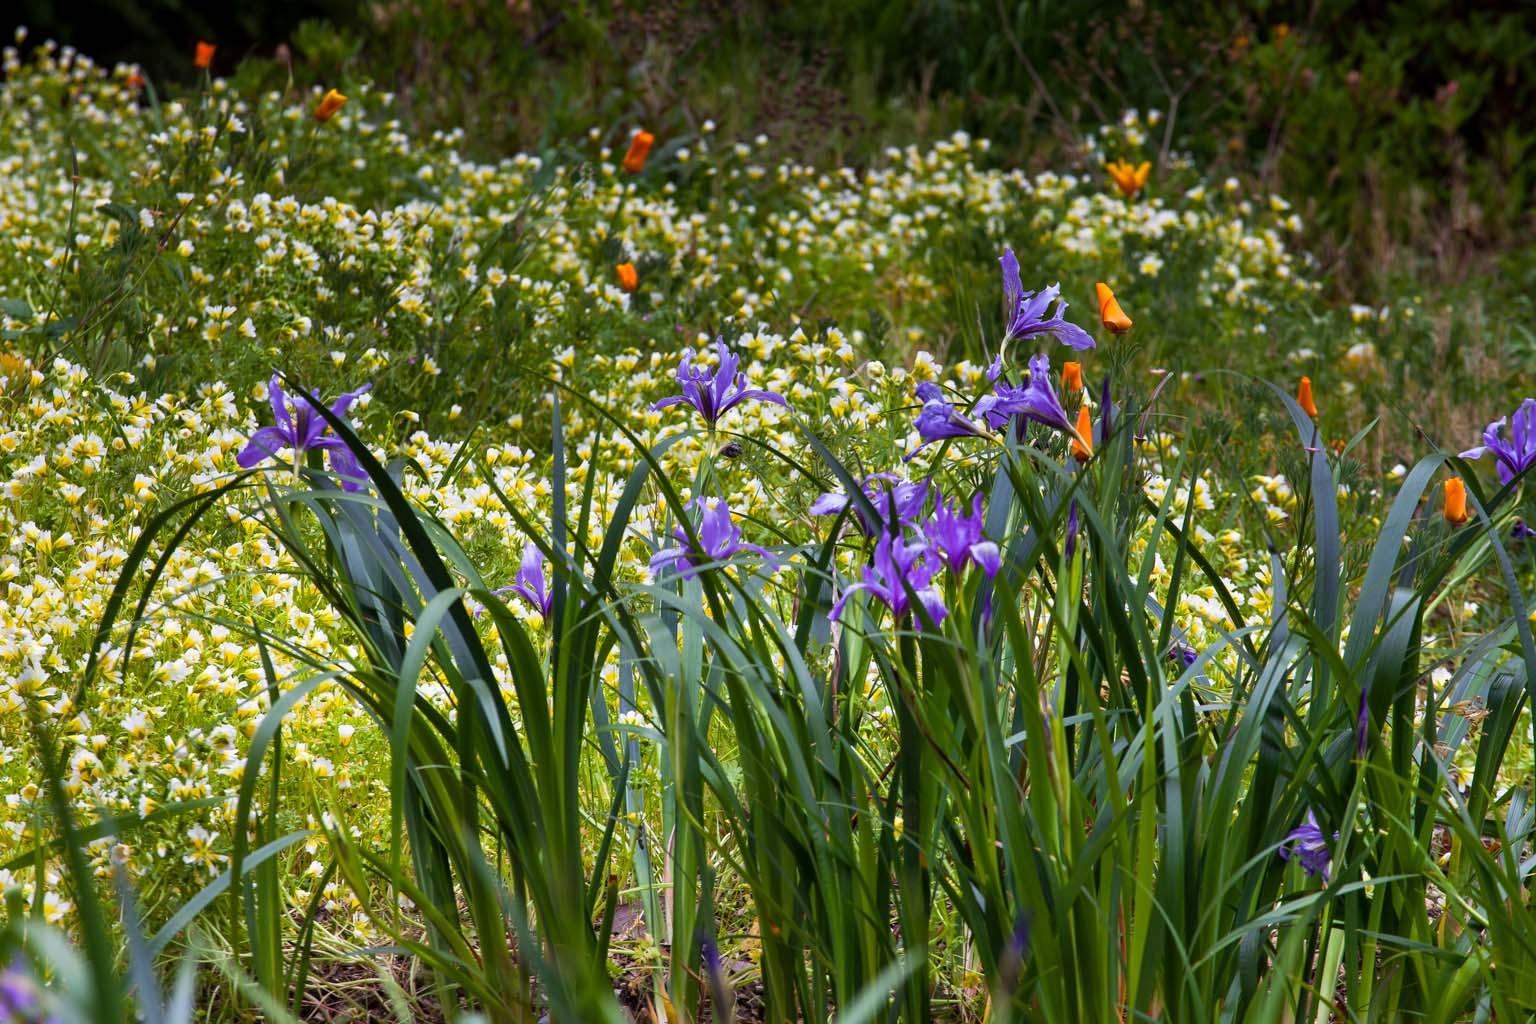 CA Native Garden   Irises, Poppies, and Meadowfoam   Saxon Holt